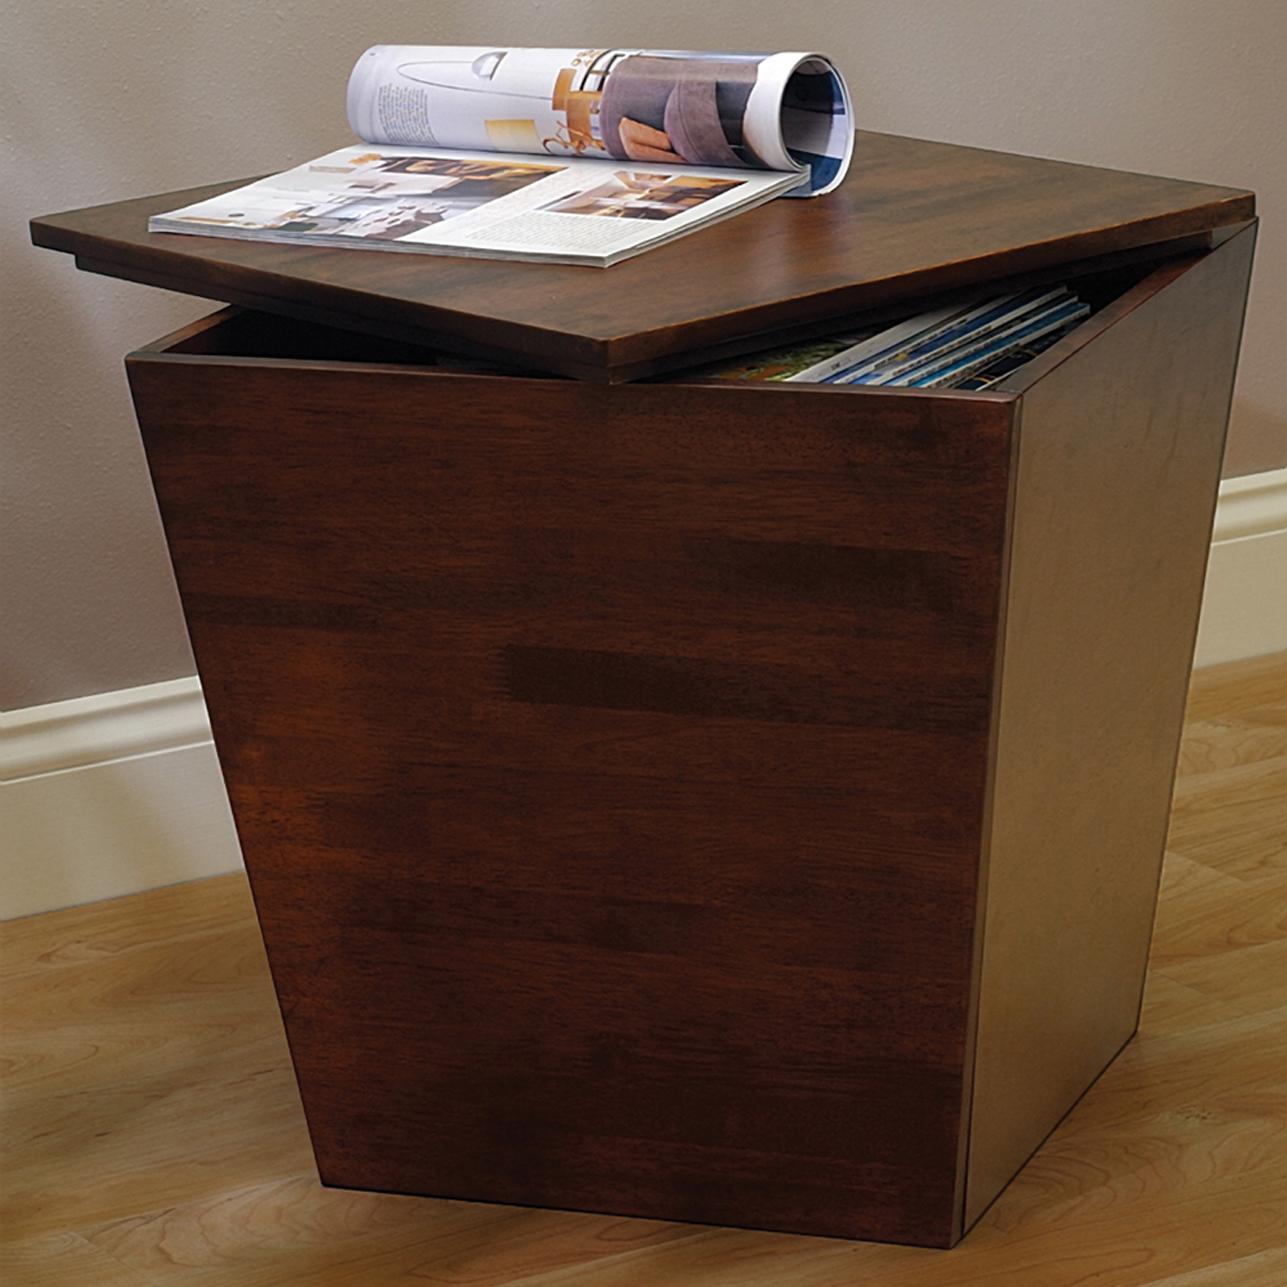 Fantastic Amazon.com: Winsome Wood Storage Cube: Kitchen & Dining AG05